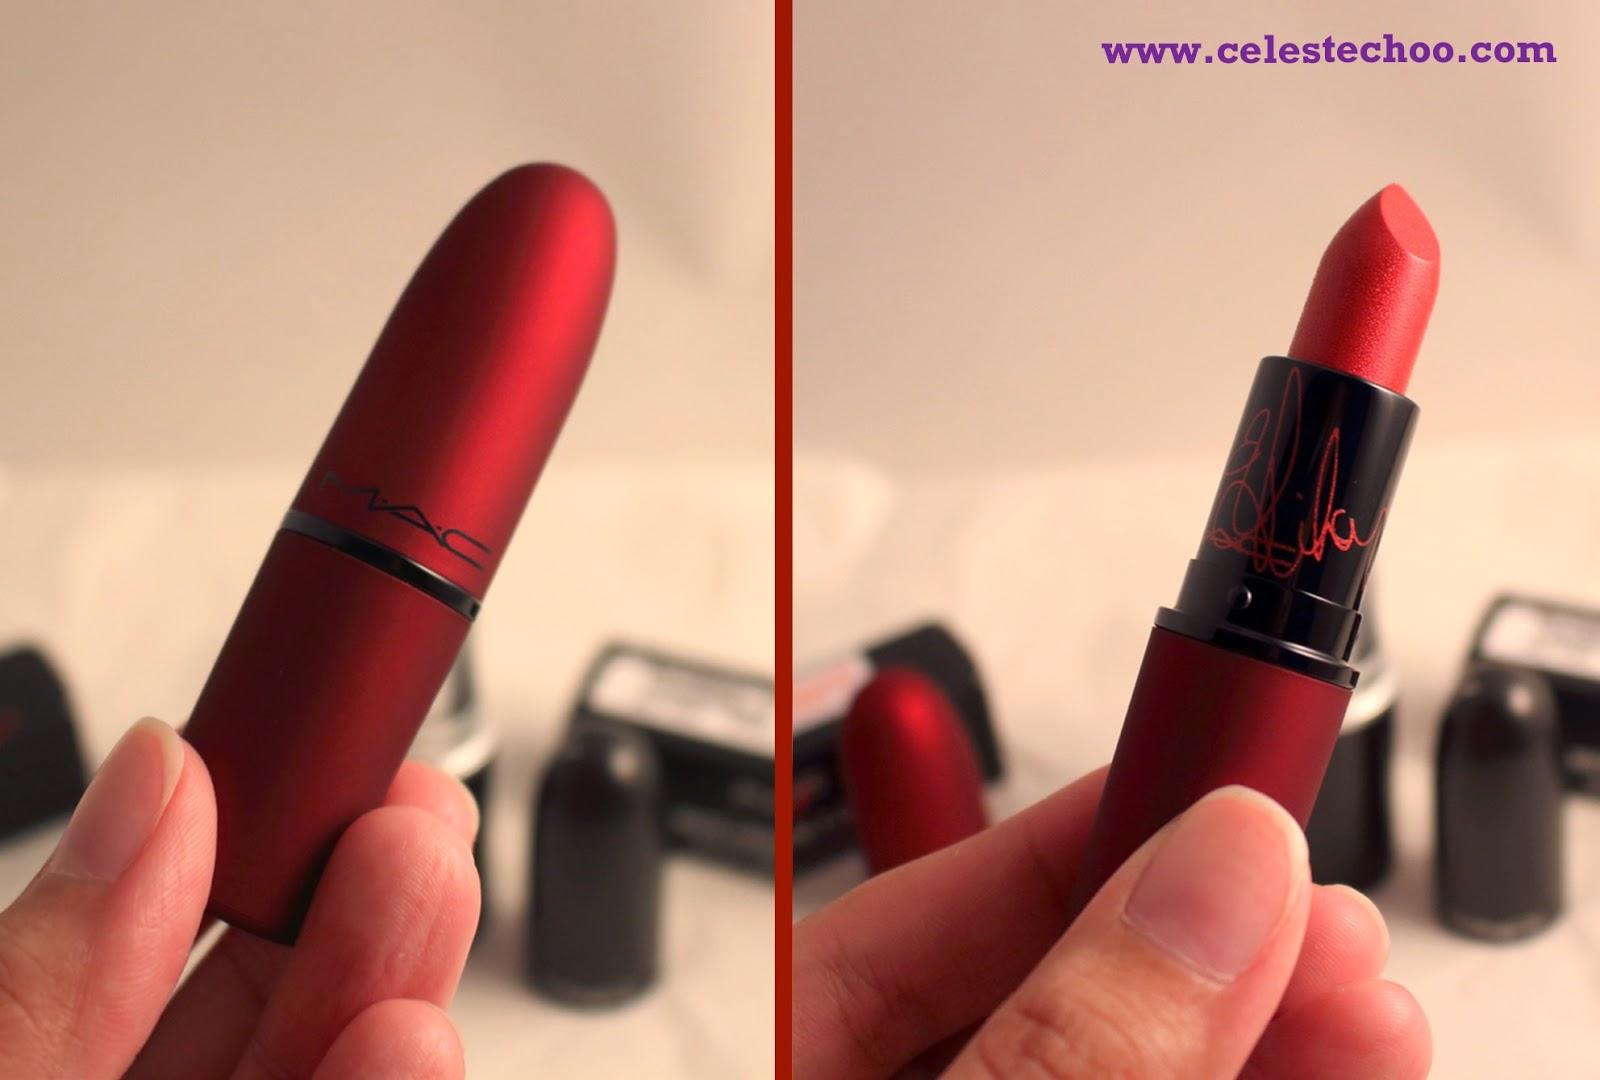 Mac Rihanna Viva Glam Red Lipstick Rm68 For 3g